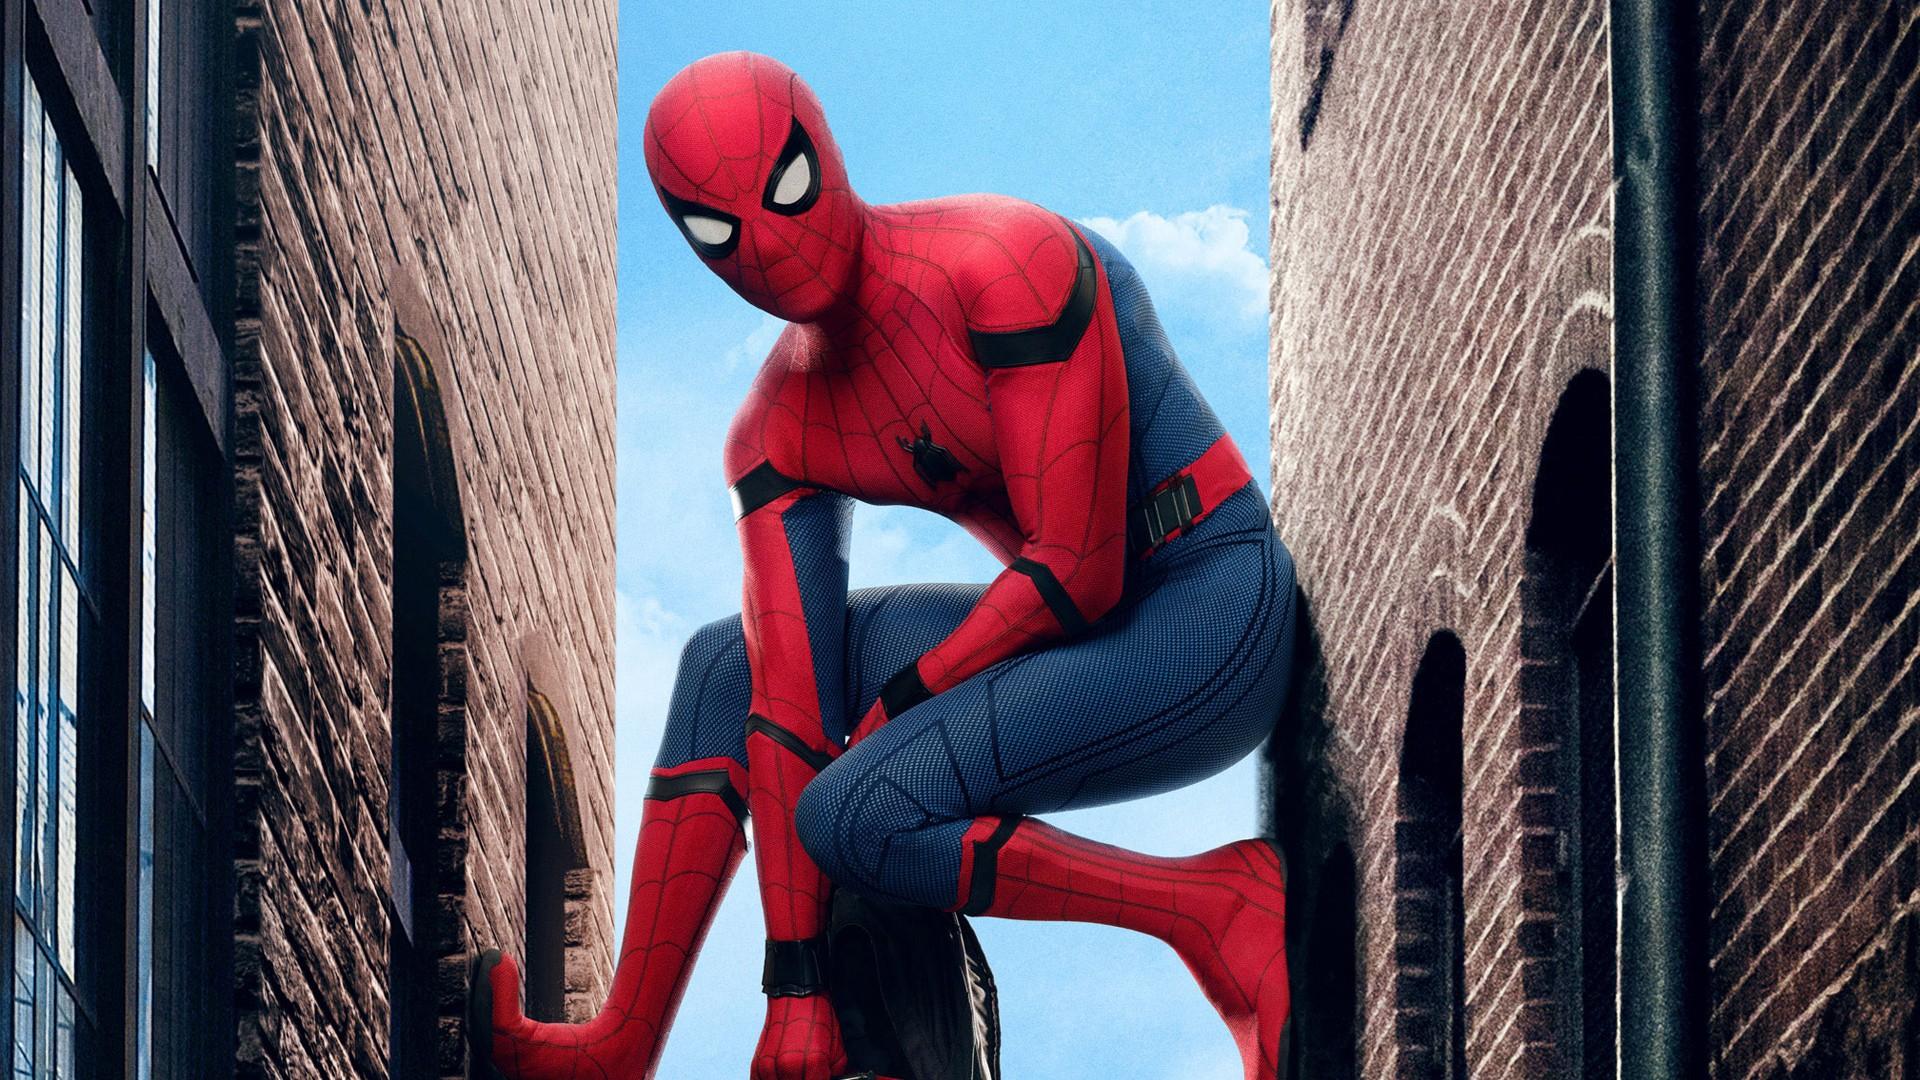 thepiratebay spiderman